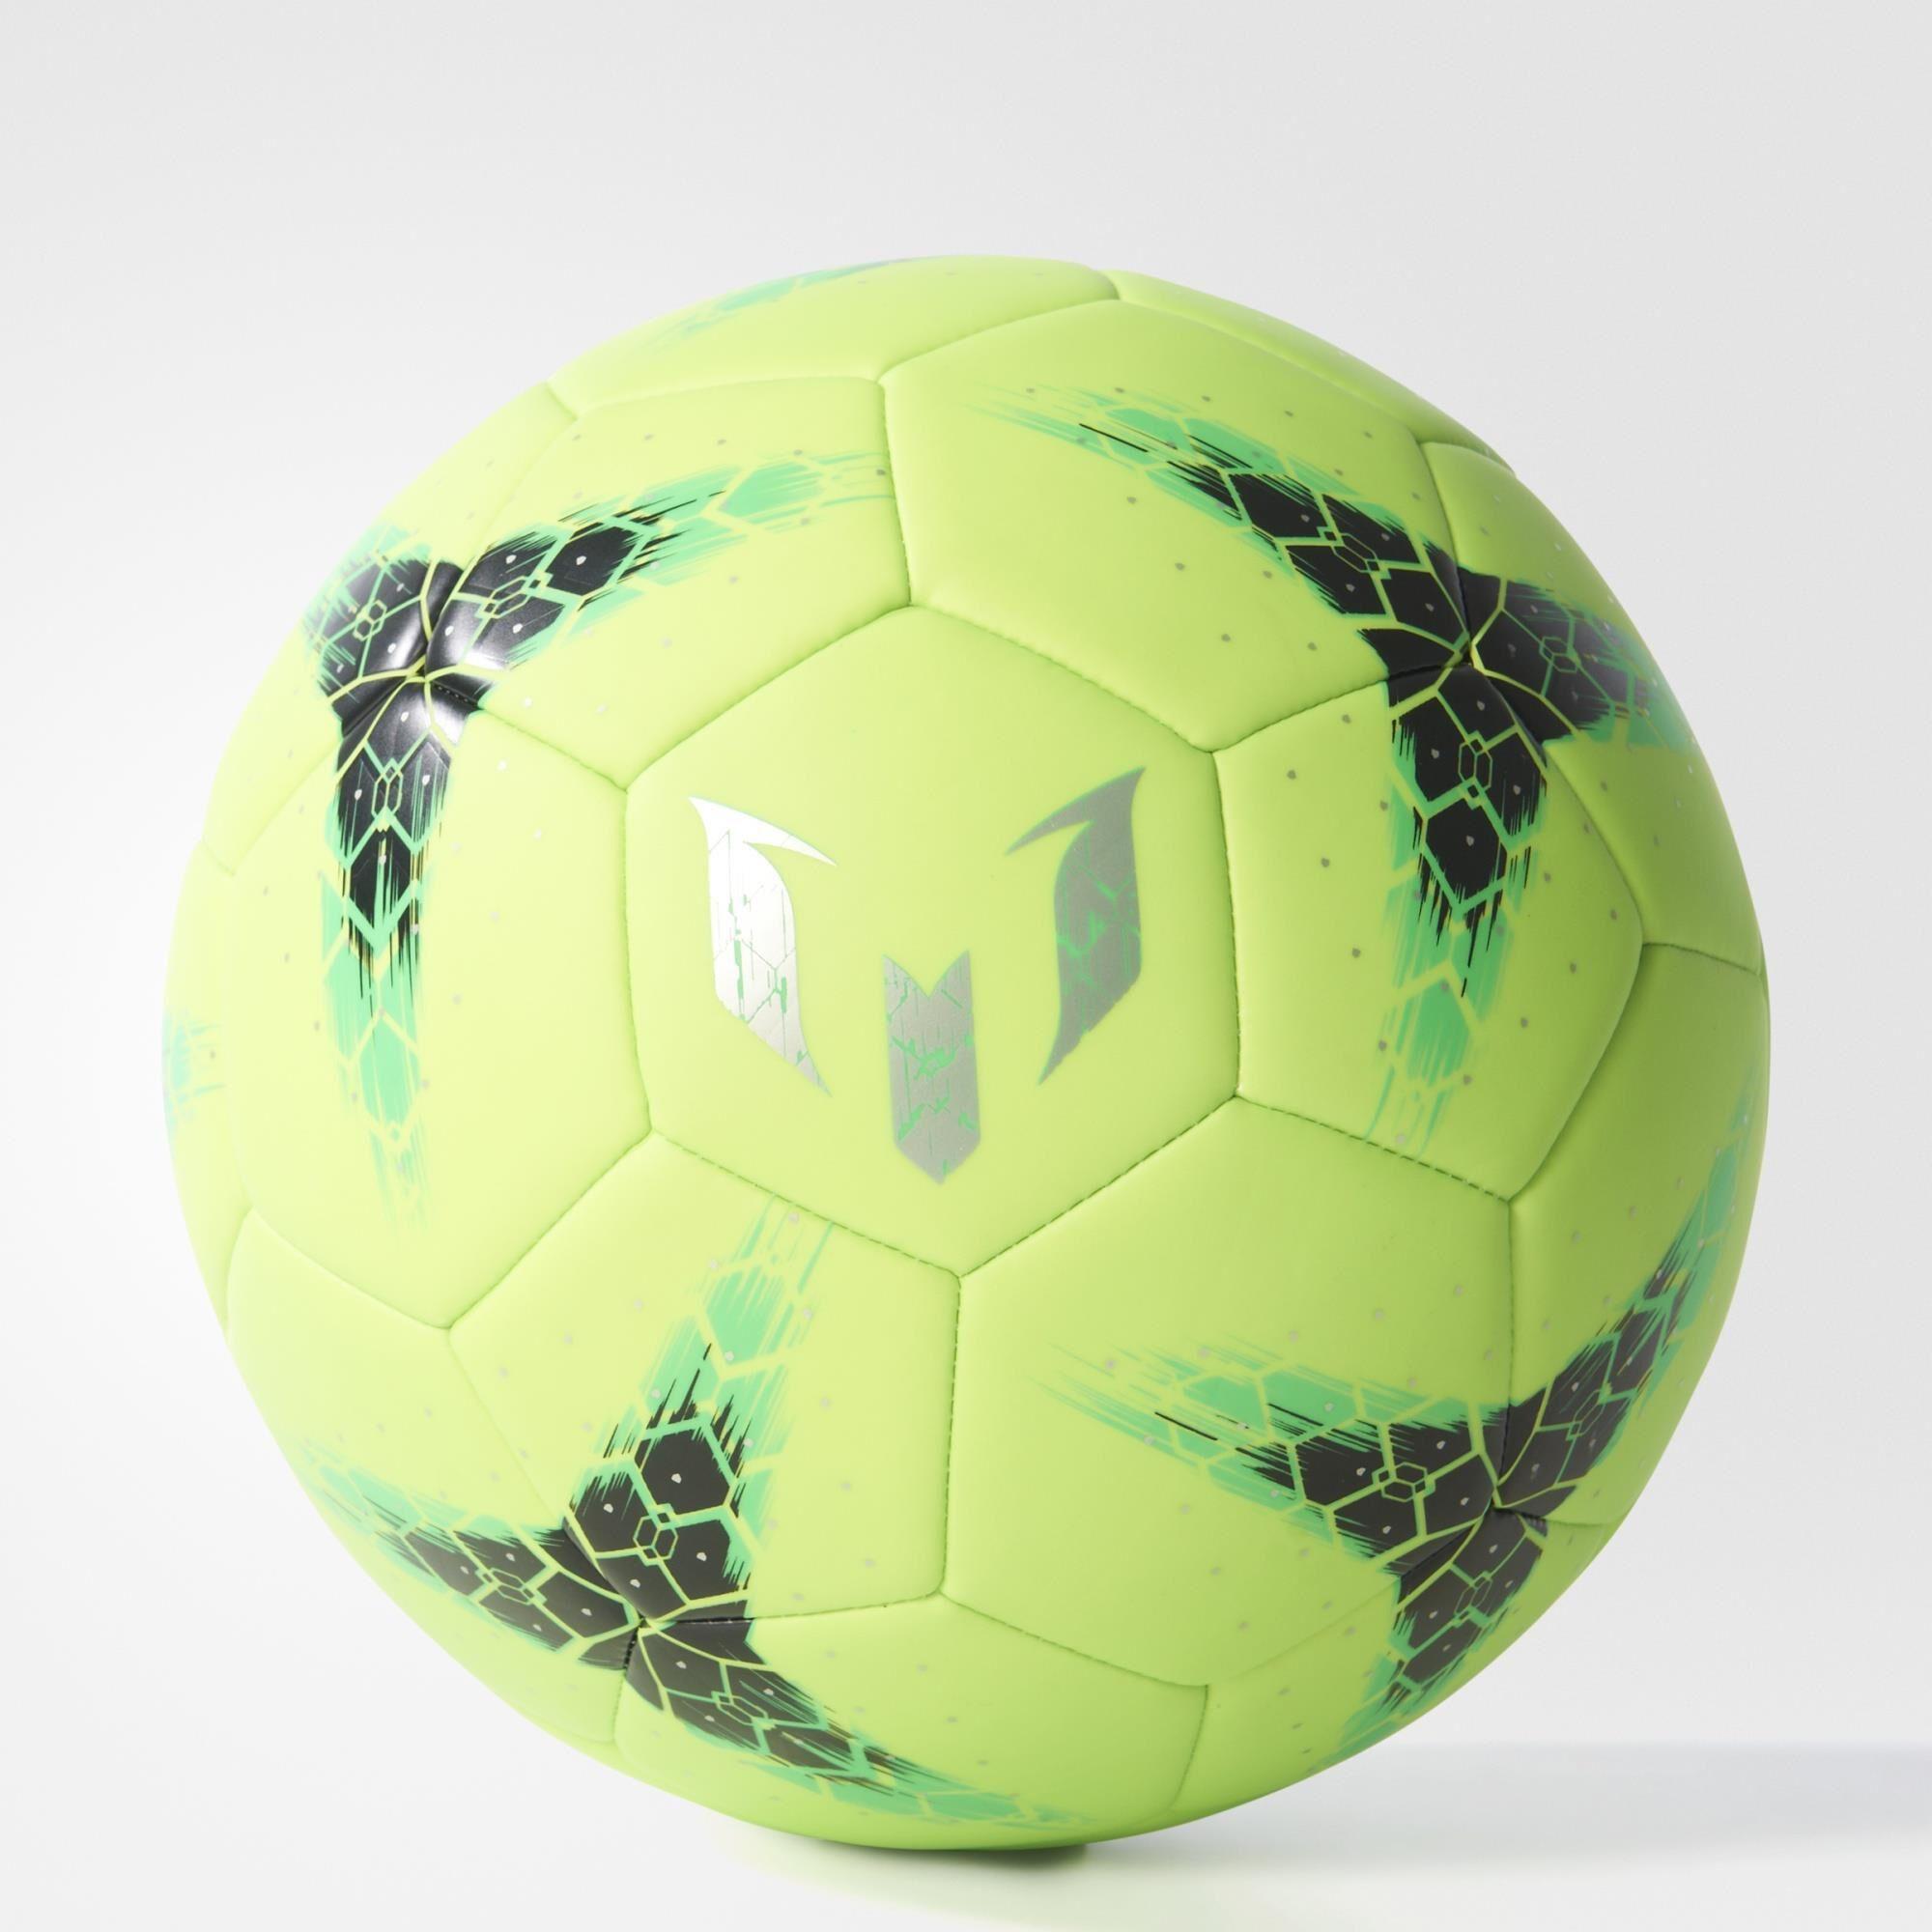 messi soccer ball adidas